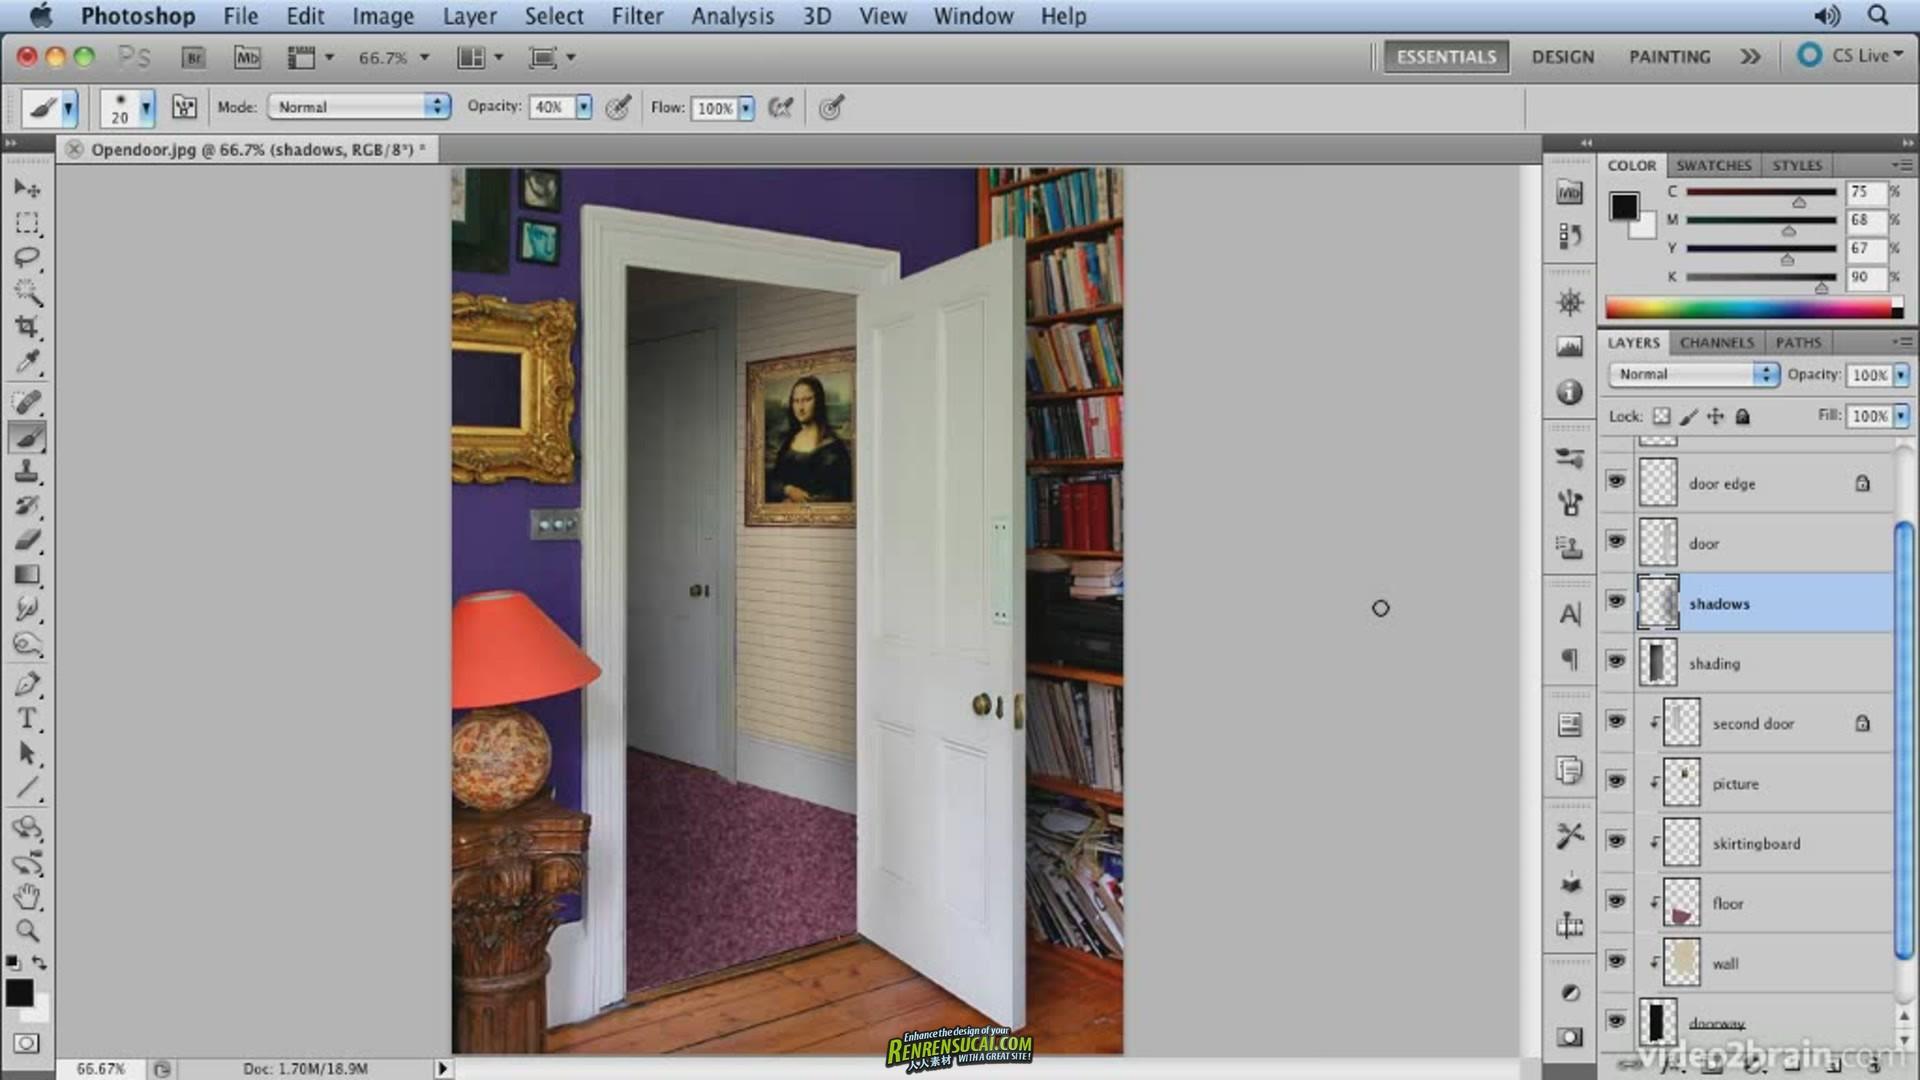 《Photoshop透视图层秘密高级教程》video2brain Creating Perspective in Photoshop 2011